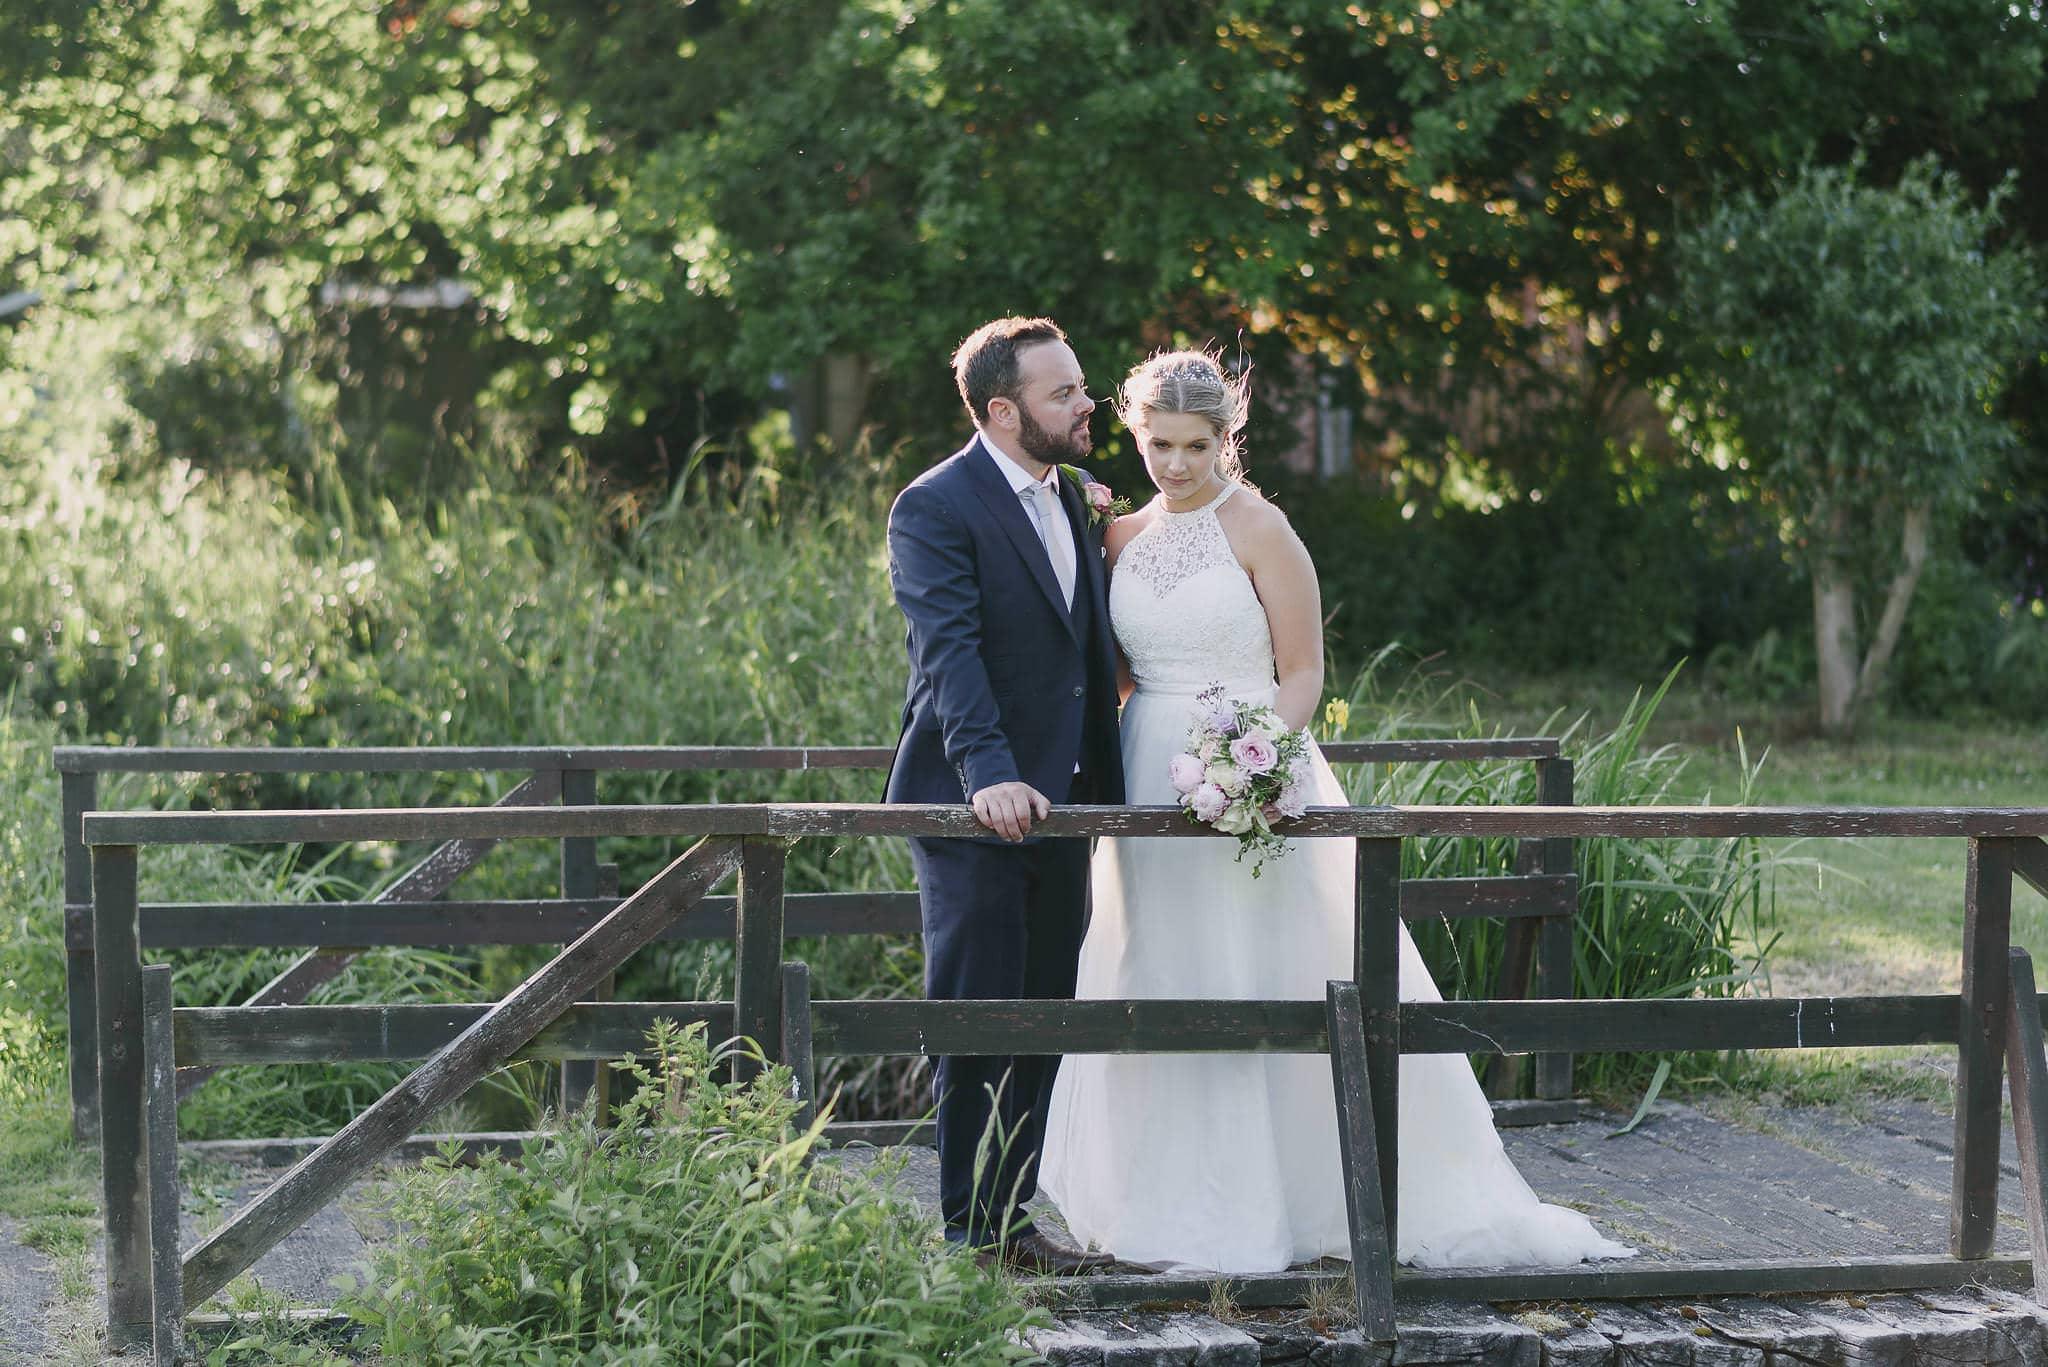 Bex & Neil - Norfolk Mead Wedding 25